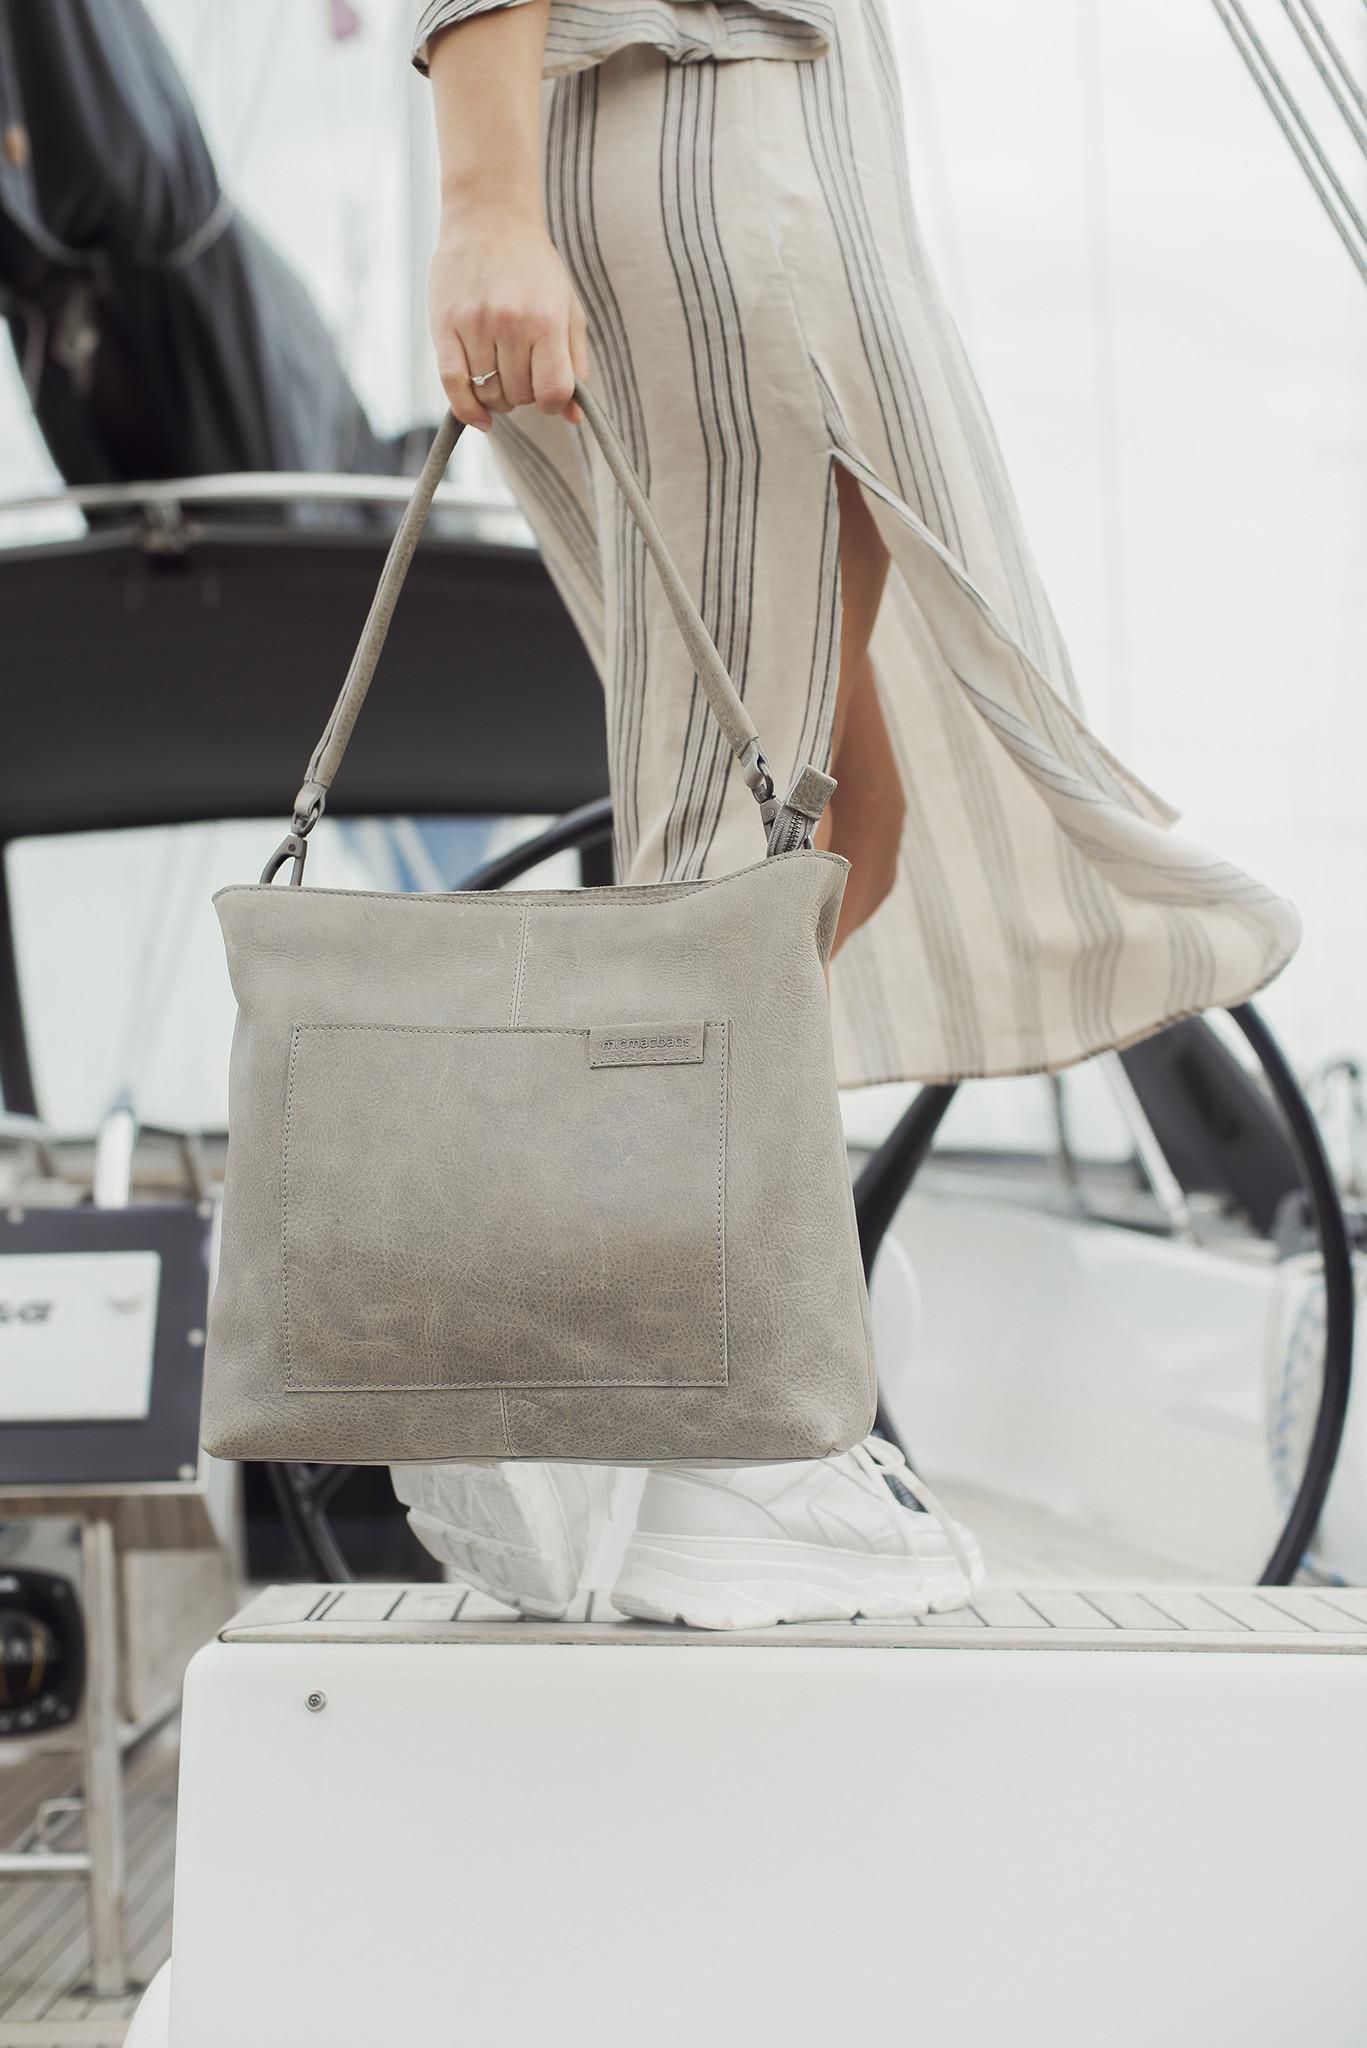 MicMacBags Shopper Côte d'Azur - Middengrijs